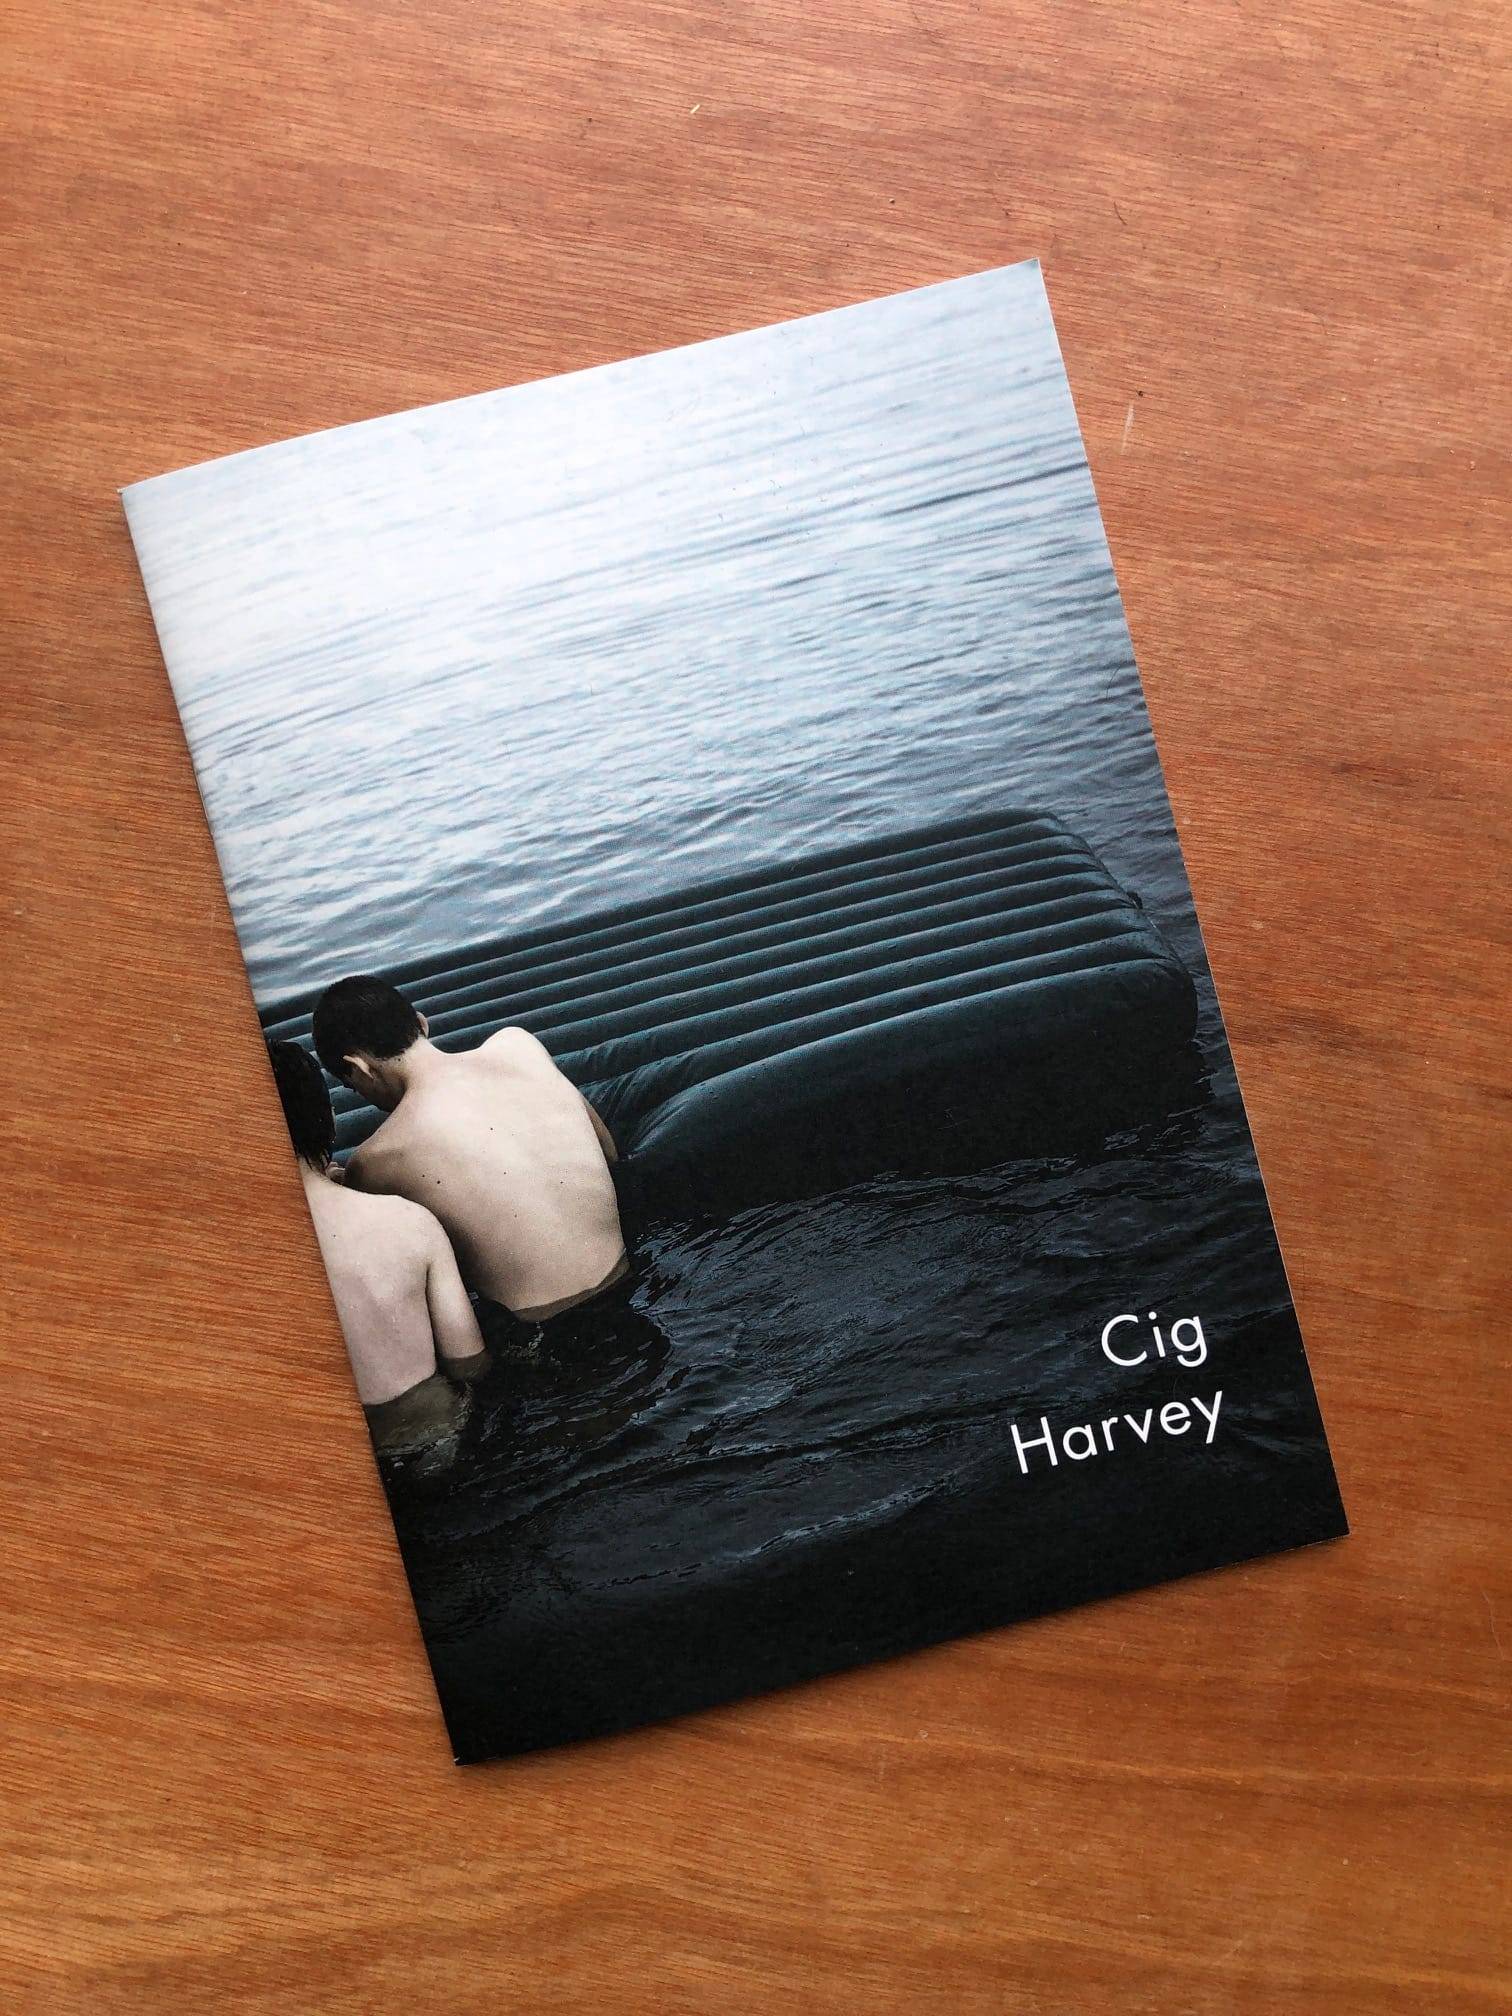 Cig Harvey